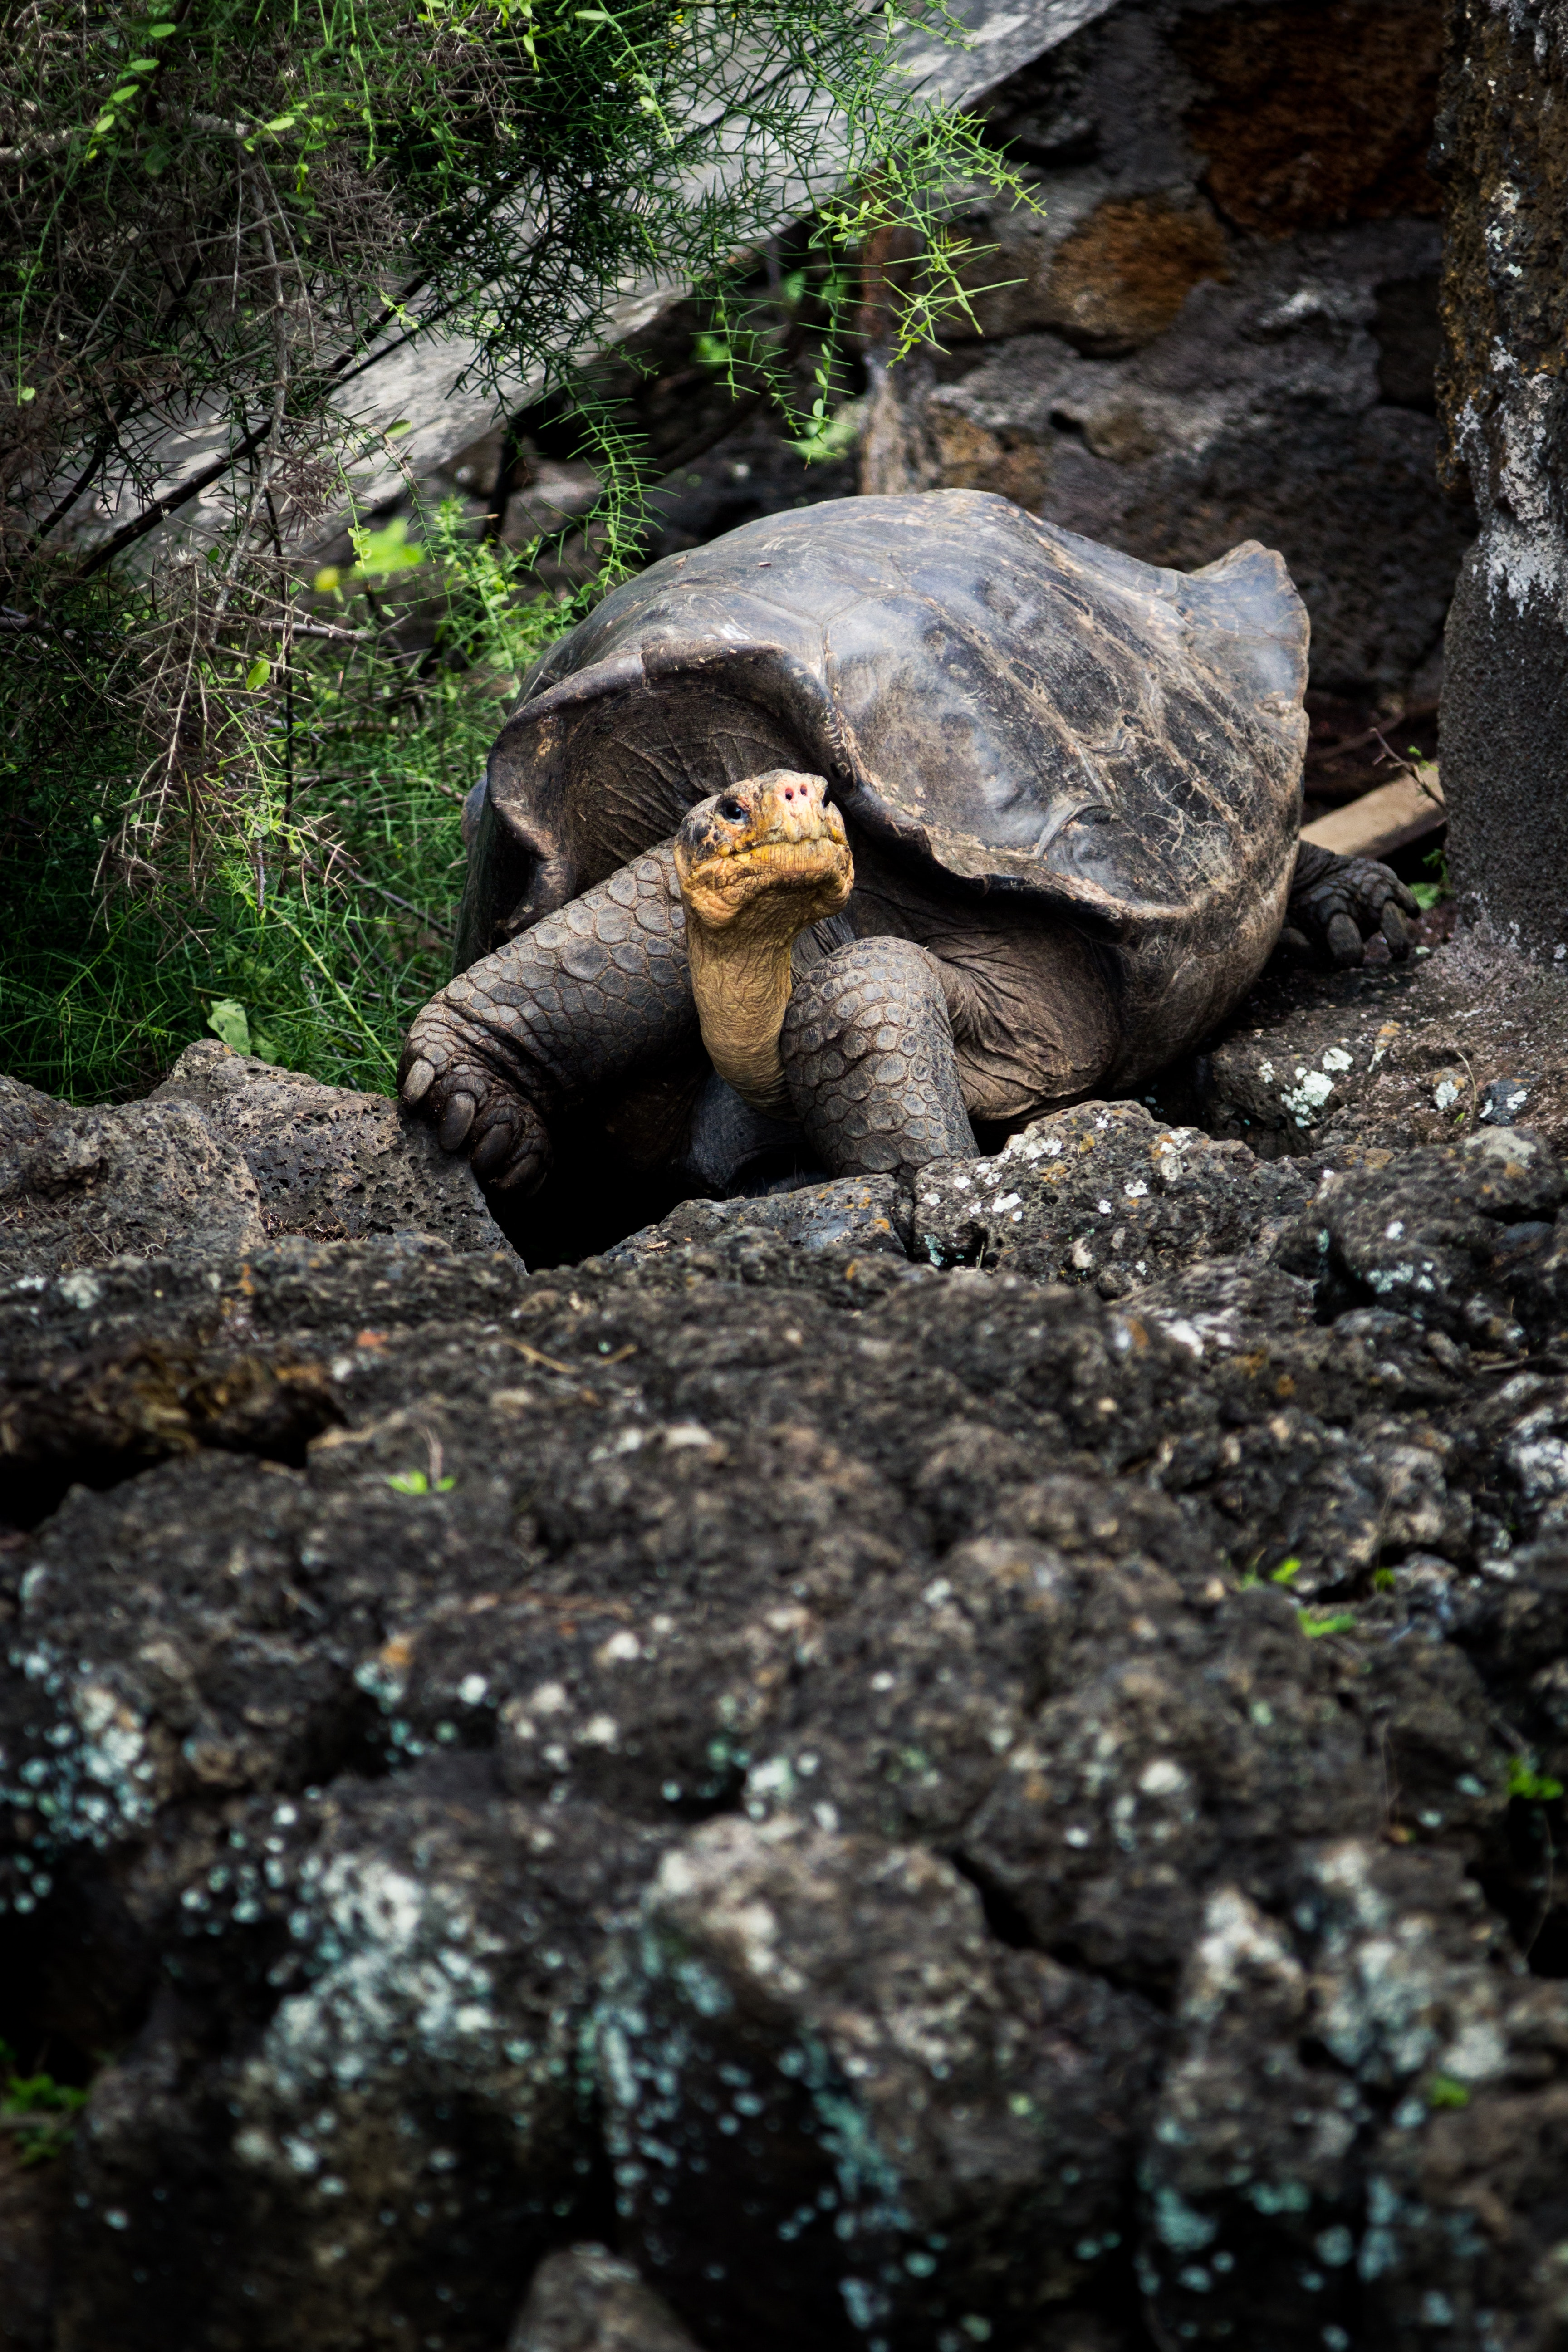 Tortoise on Rock, Animal, Slow, Wildlife, Wild animal, HQ Photo